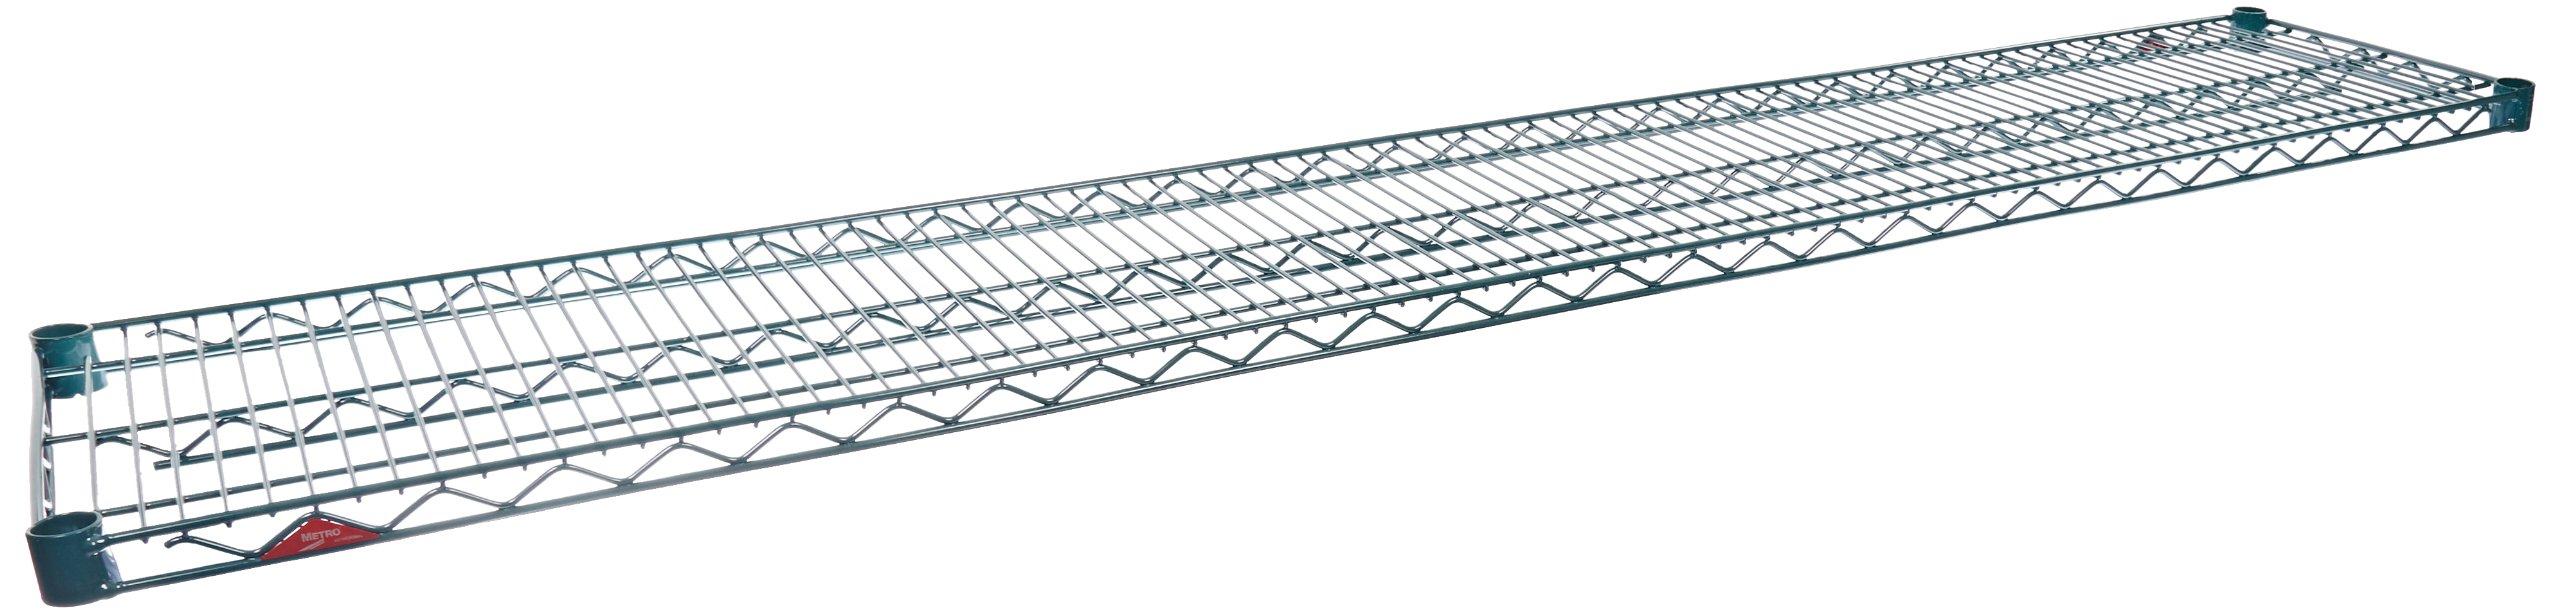 Metro 1472NK3 Super Erecta Metroseal 3, Steel Wire Shelf with Microban, 600 lb. Capacity, 1'' Height x 72'' Width x 14'' Depth (Pack of 2)